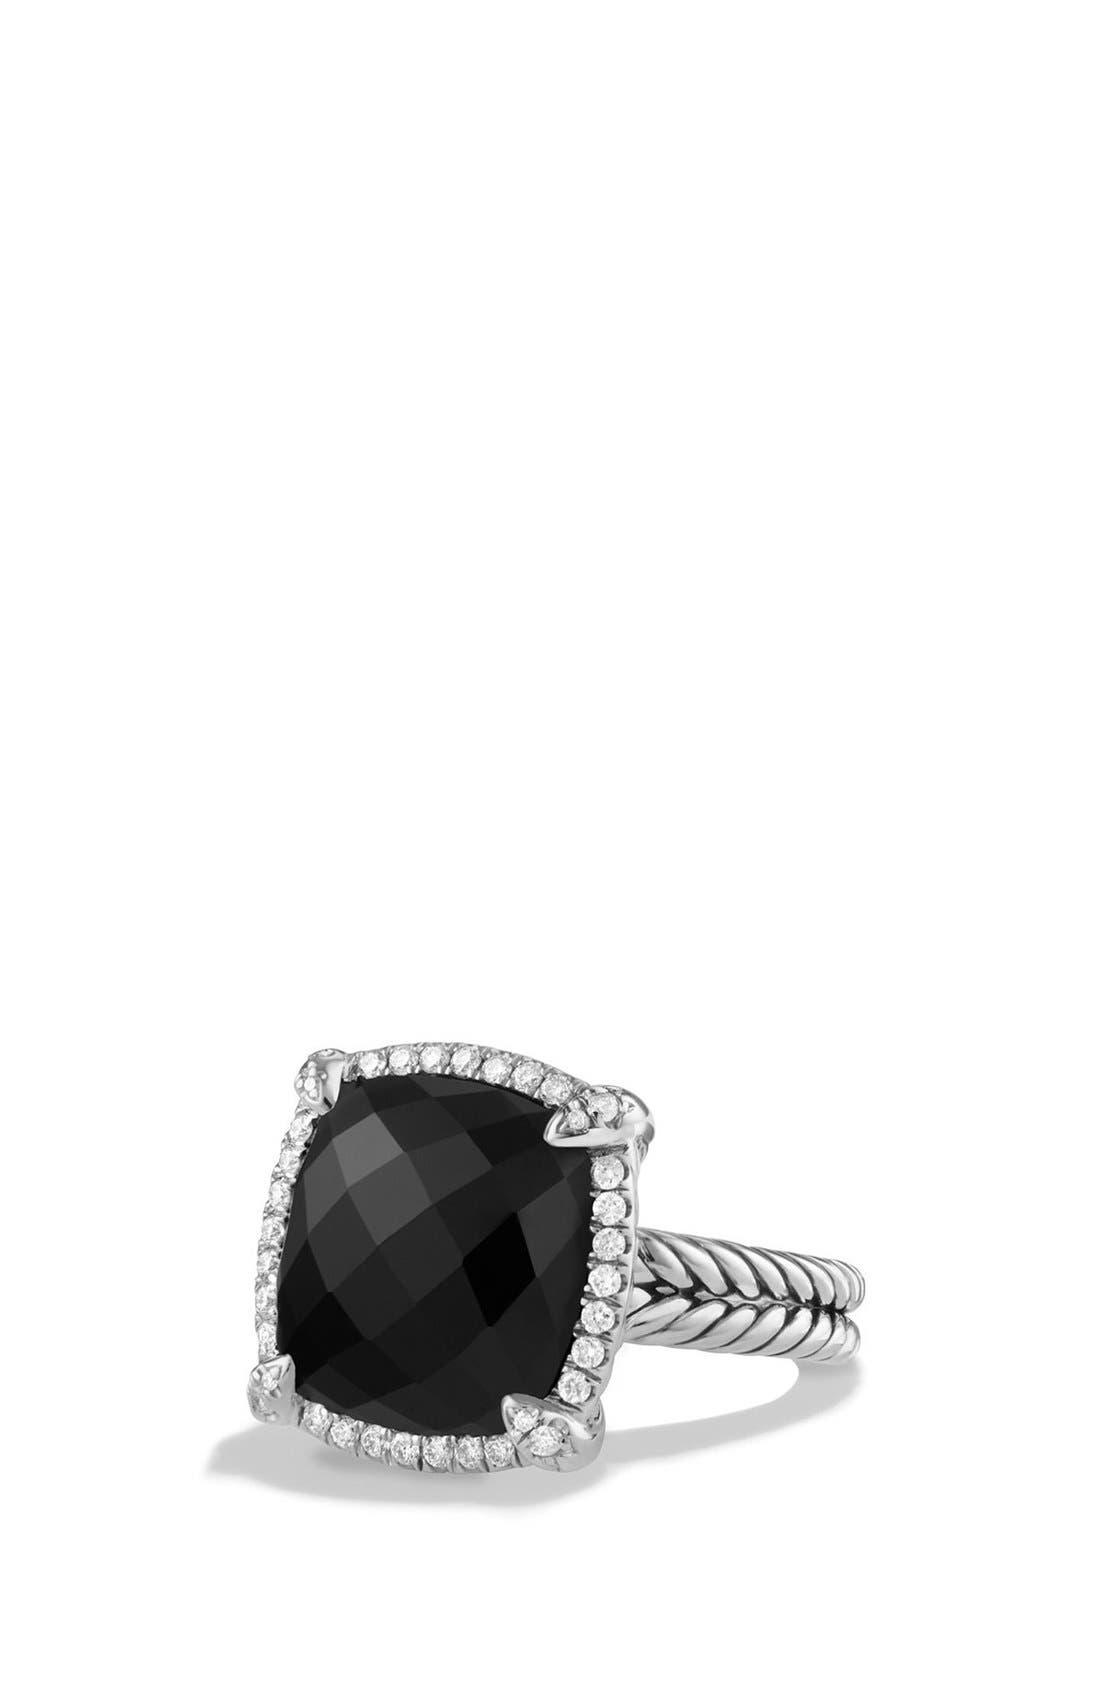 DAVID YURMAN Châtelaine Large Pavé Bezel Ring with Diamonds